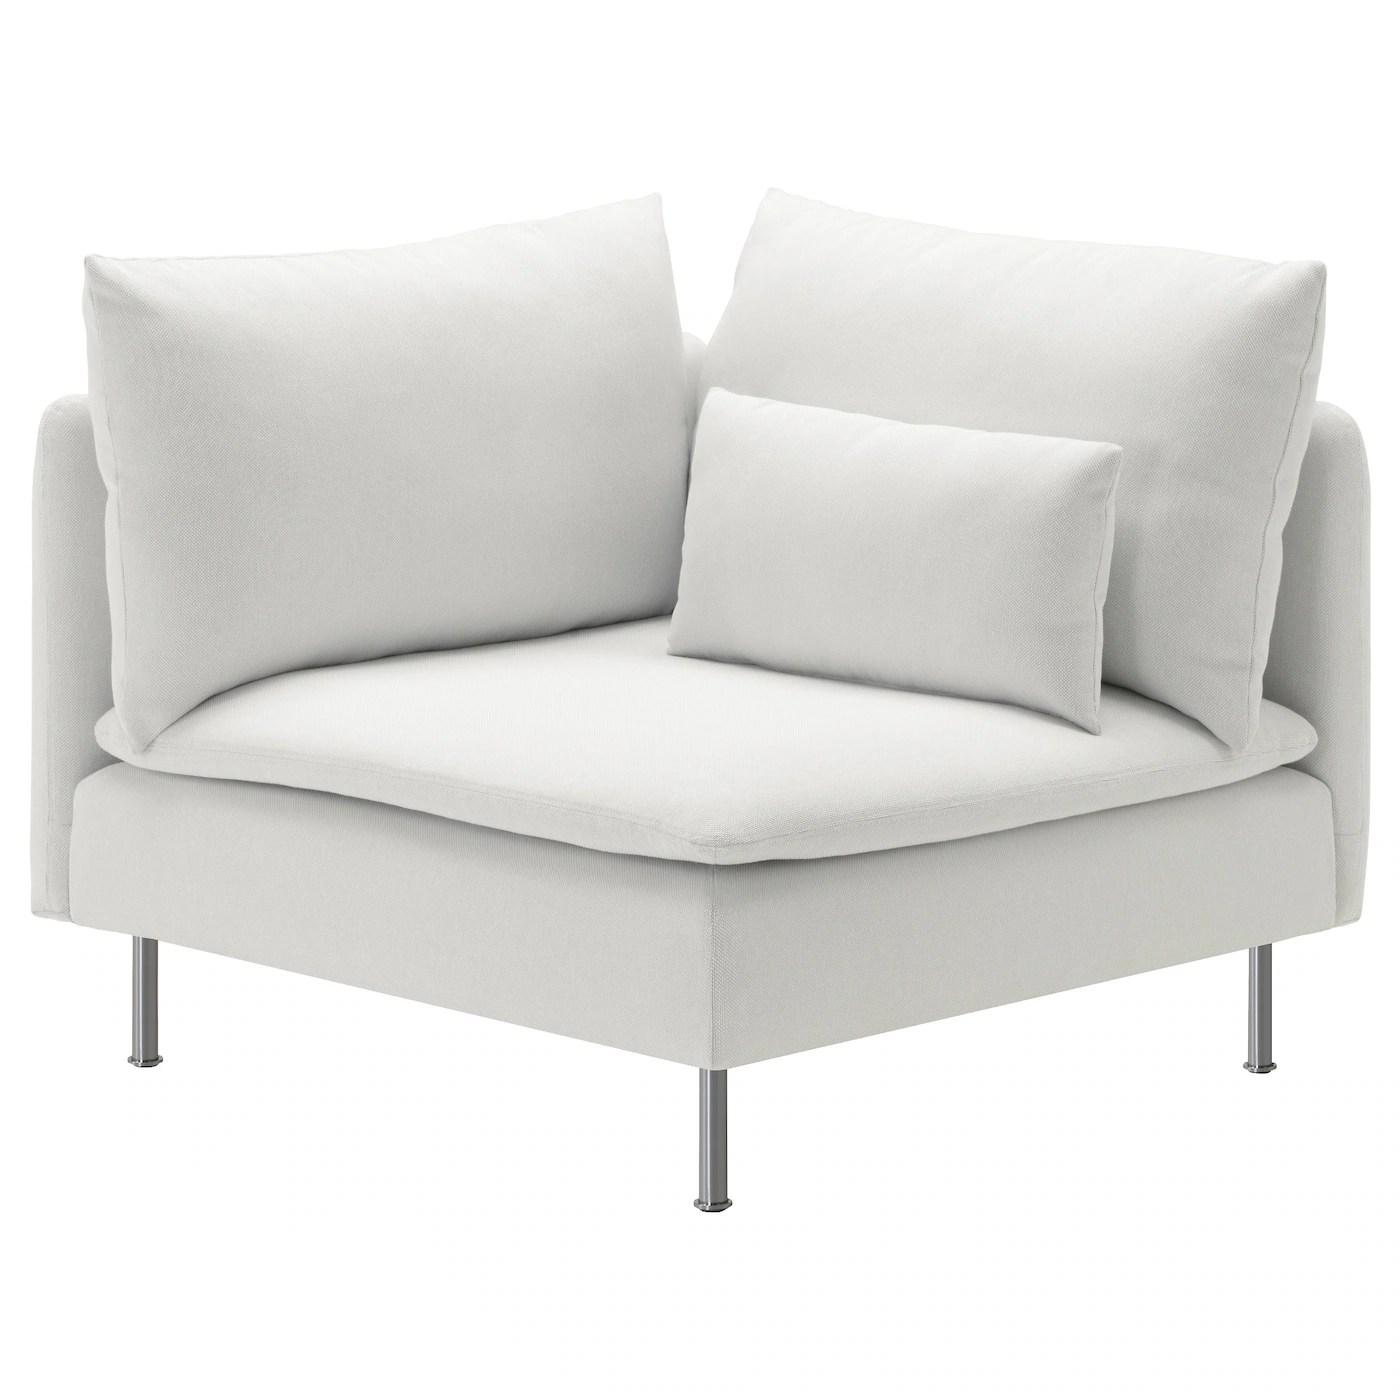 modular sofas ireland simmons sofa reviews and sectional ikea